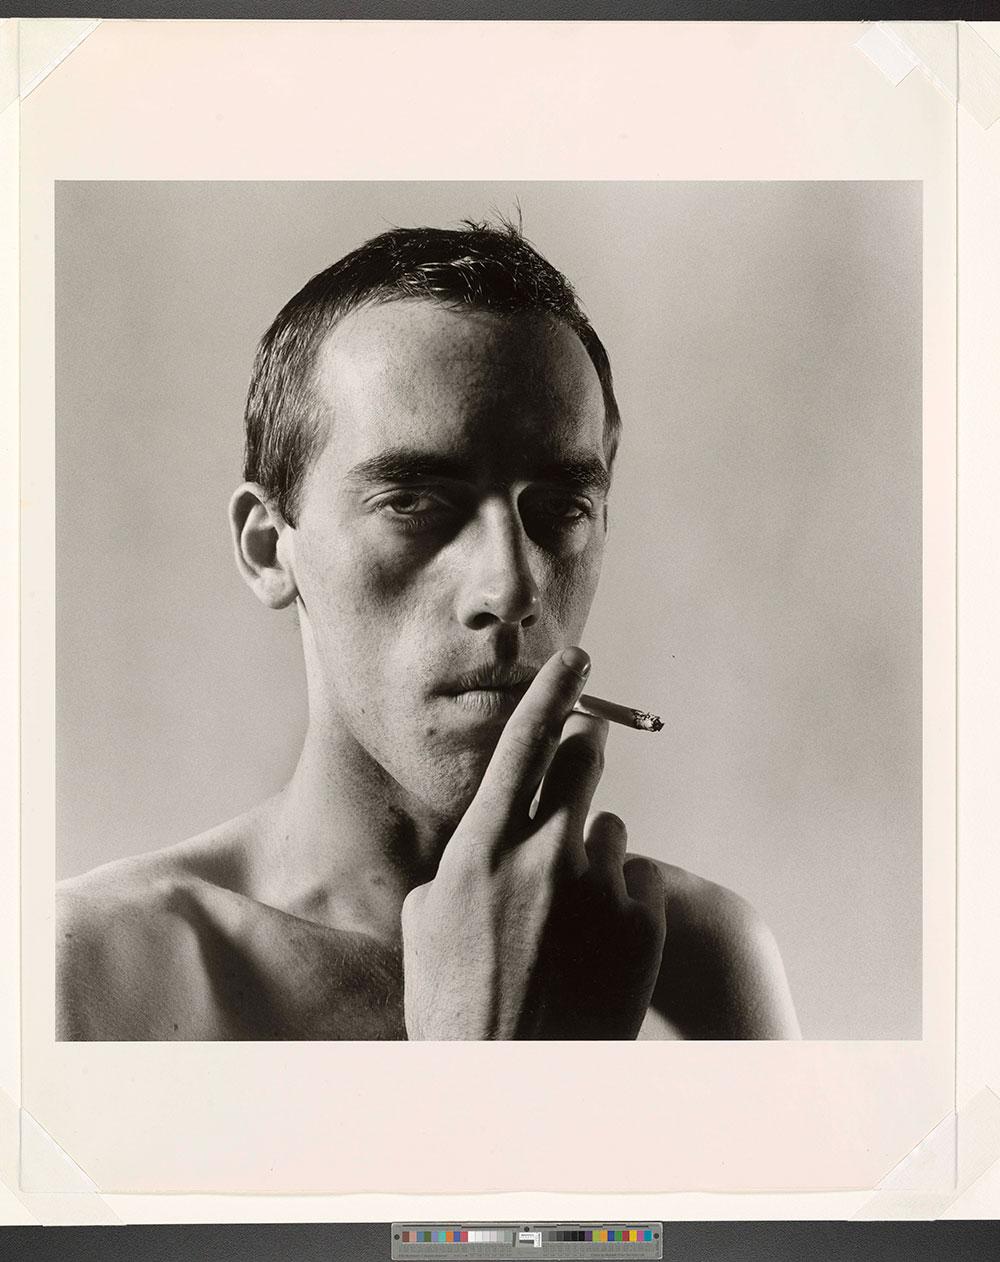 David Wojnarowicz Smoking, 1975 | Courtesy of Pace/MacGill Gallery ©Peter Hujar Archive